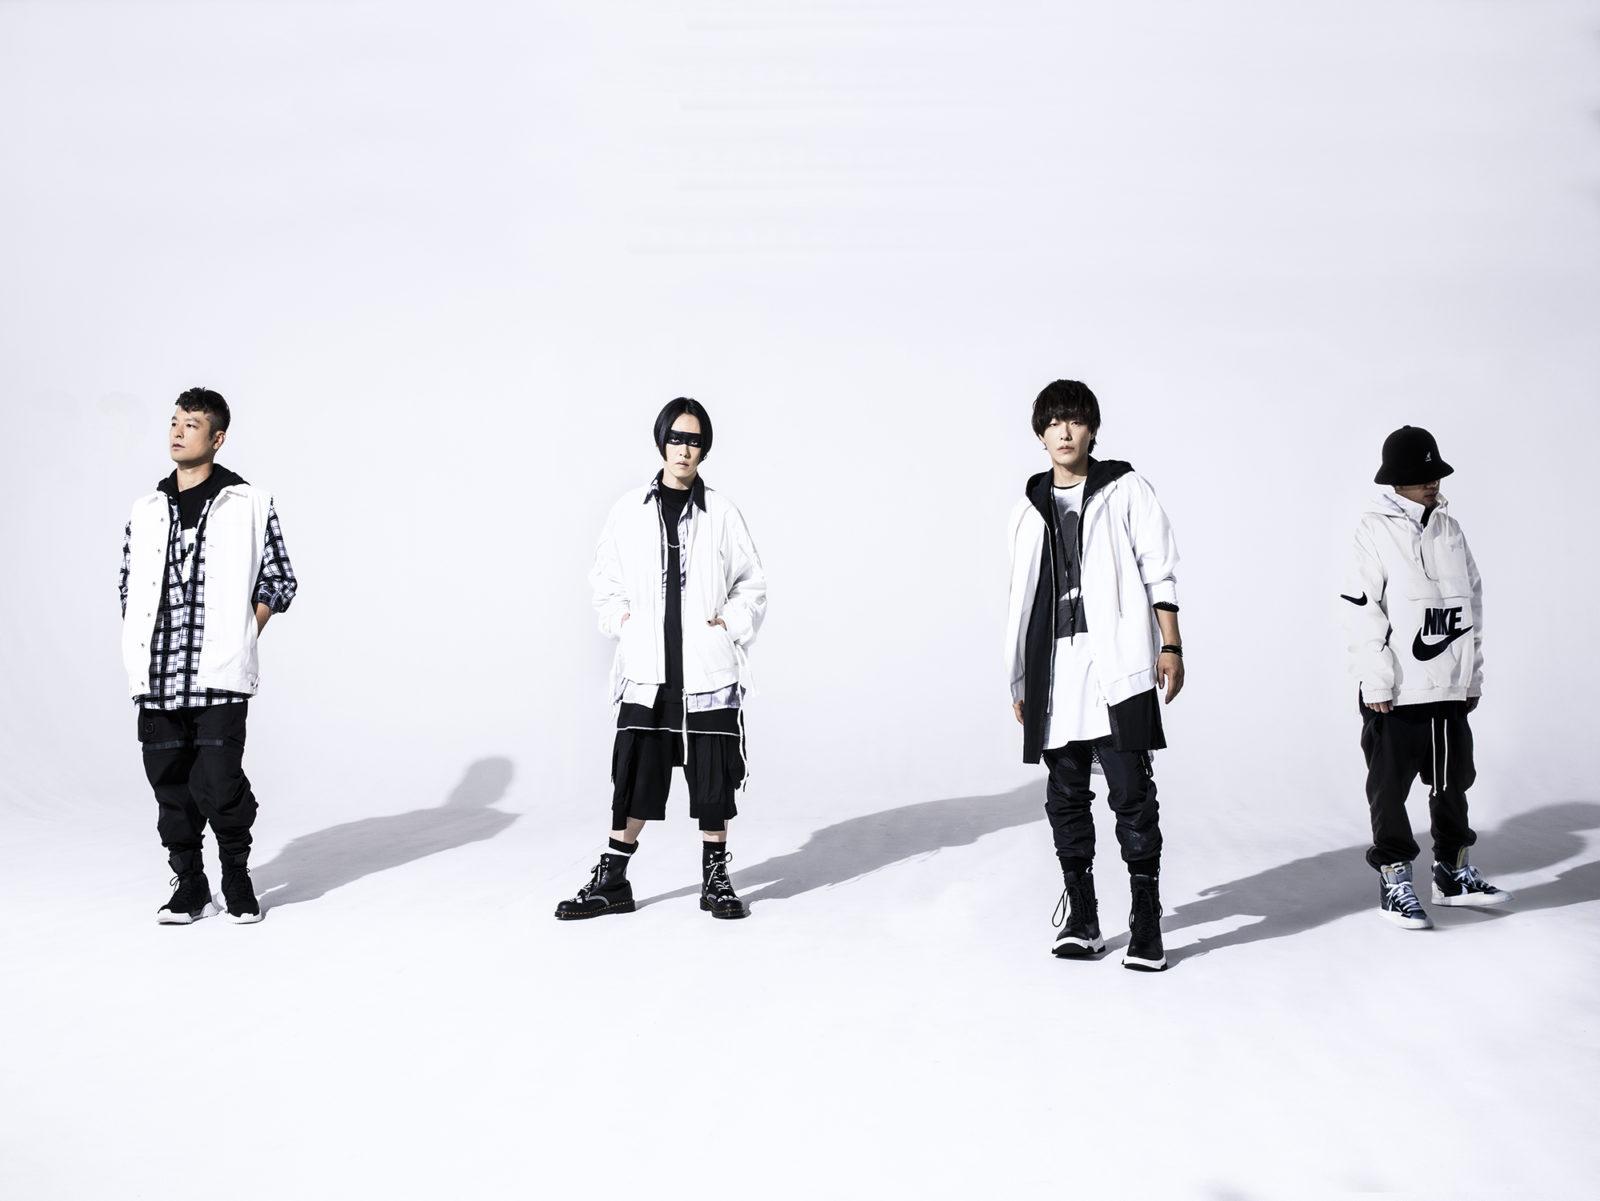 SPYAIRデビュー10周年、新ビジュアル公開&11月にシングルCD発売決定サムネイル画像